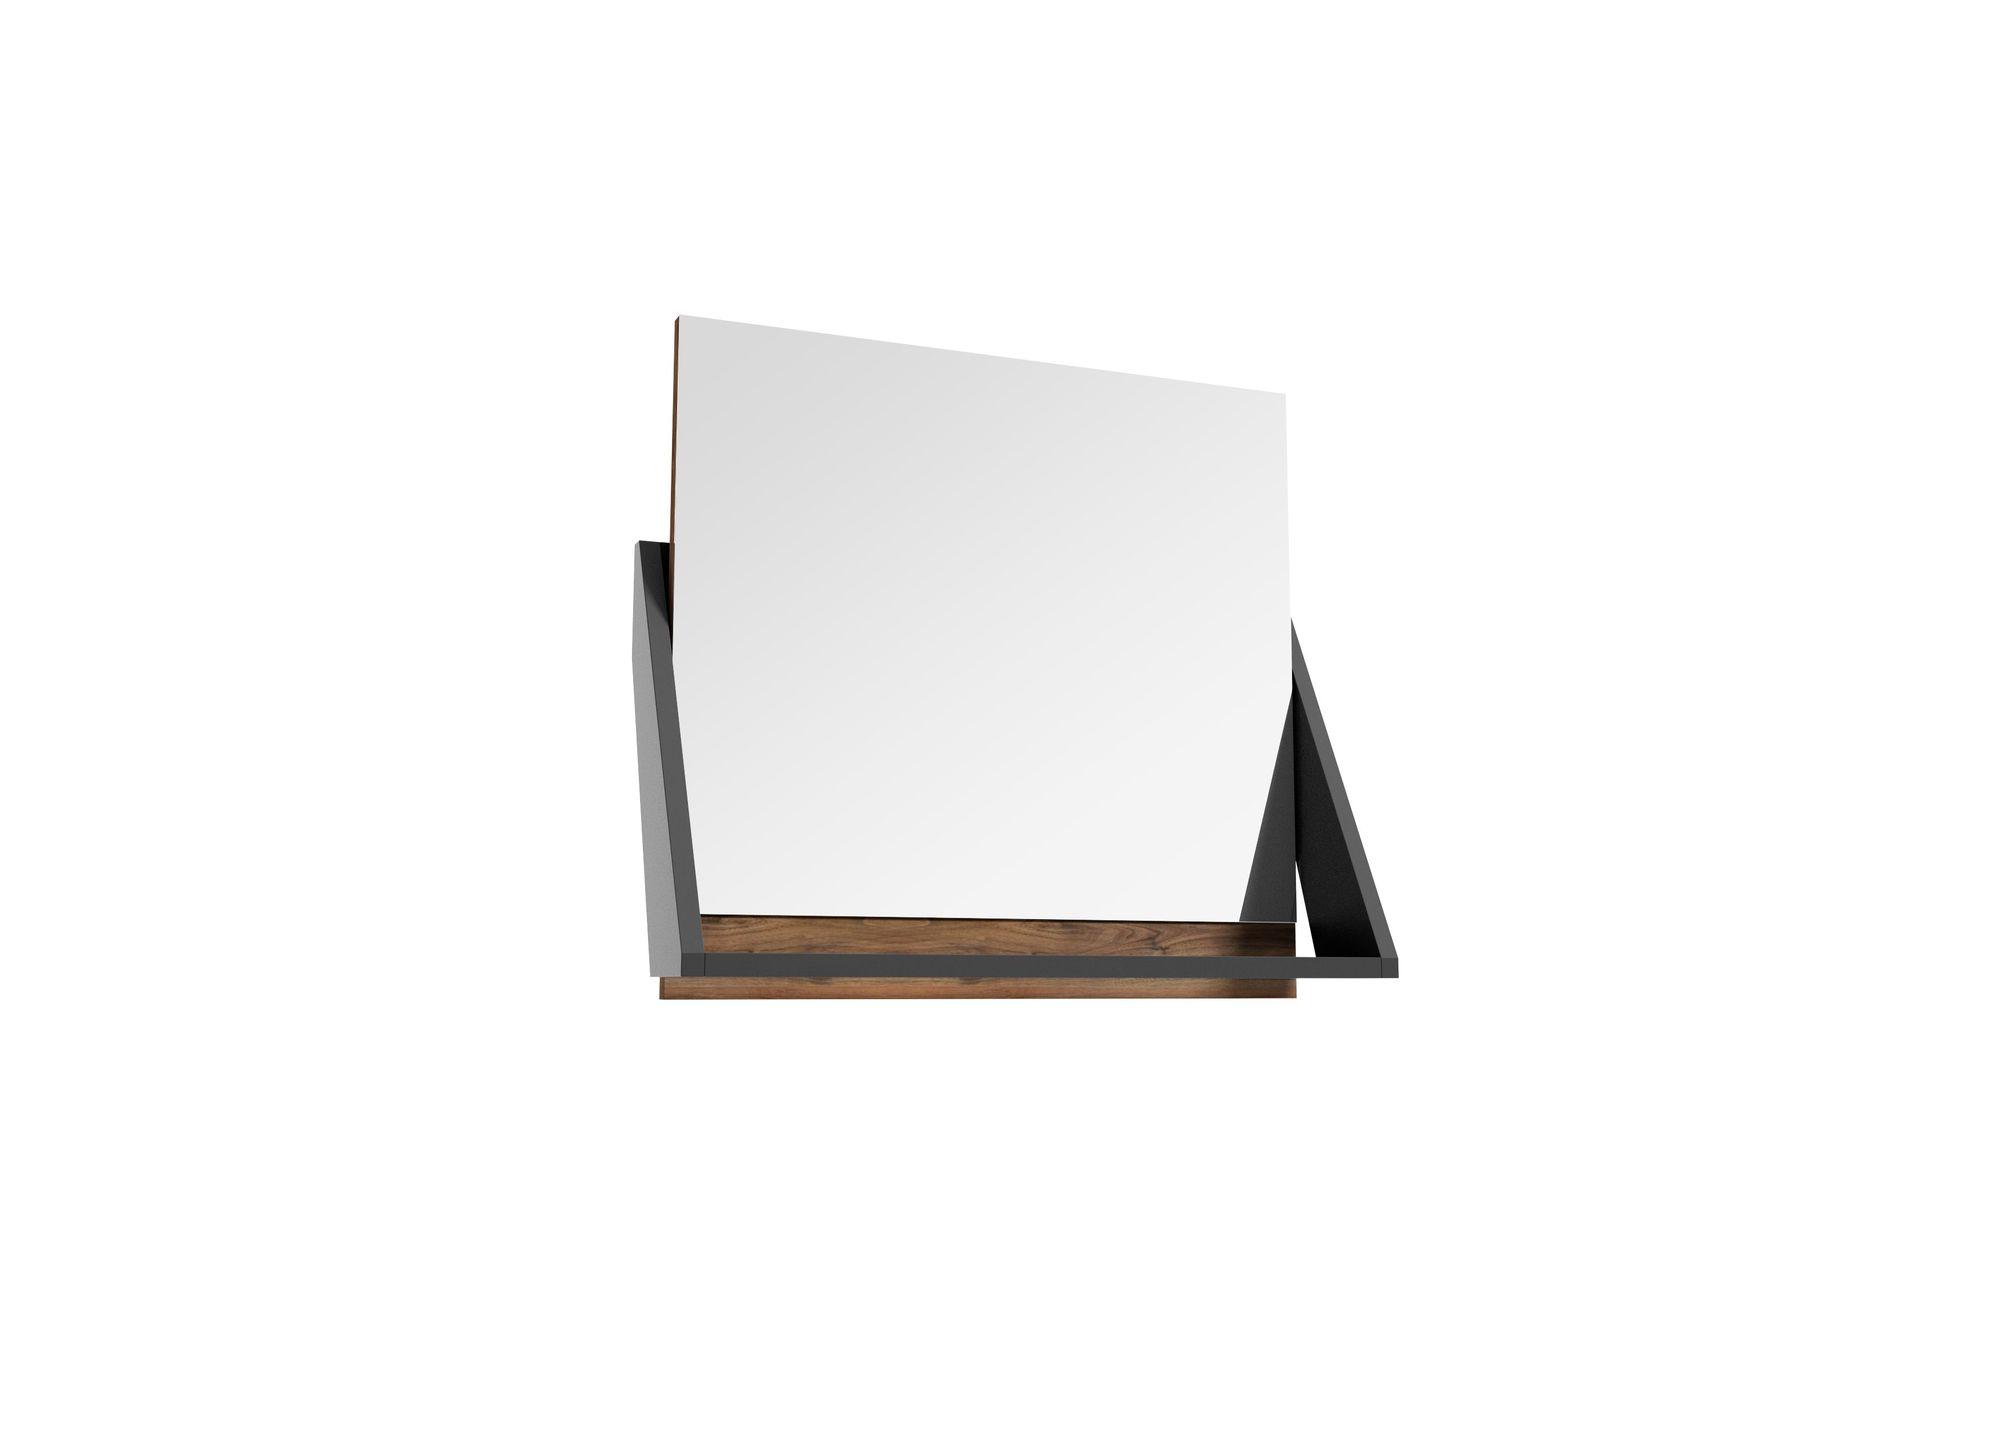 Lustro Defra Op-Arty L60 Orzech Rockford/Czarny Mat 64,2×58,5cm 215-L-06007